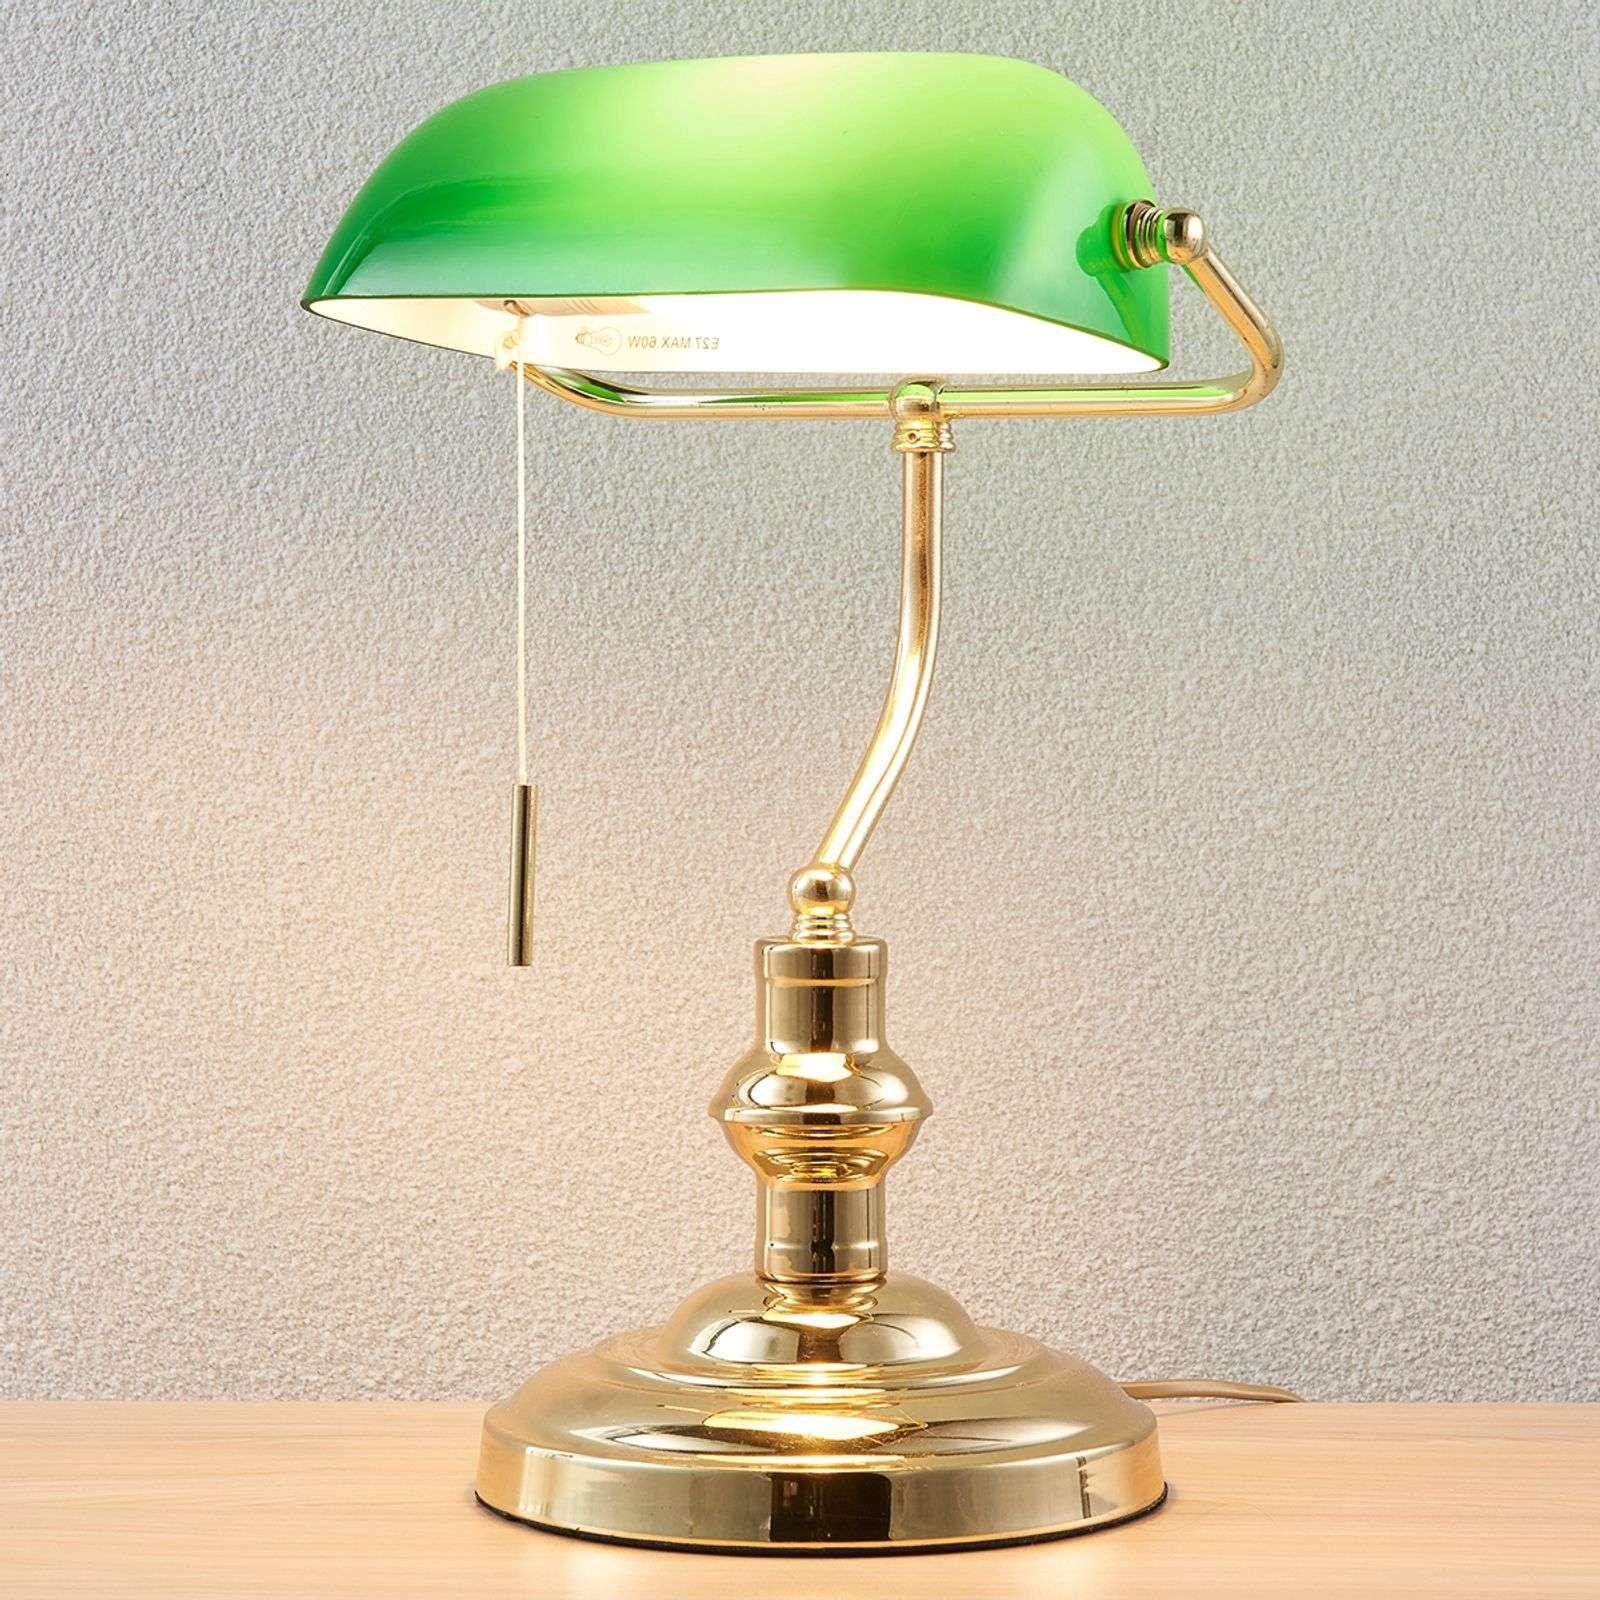 Lampe Banker Milenka Laiton Poli En 2020 Lampe De Bureau Laiton Poli Lampes Antiques